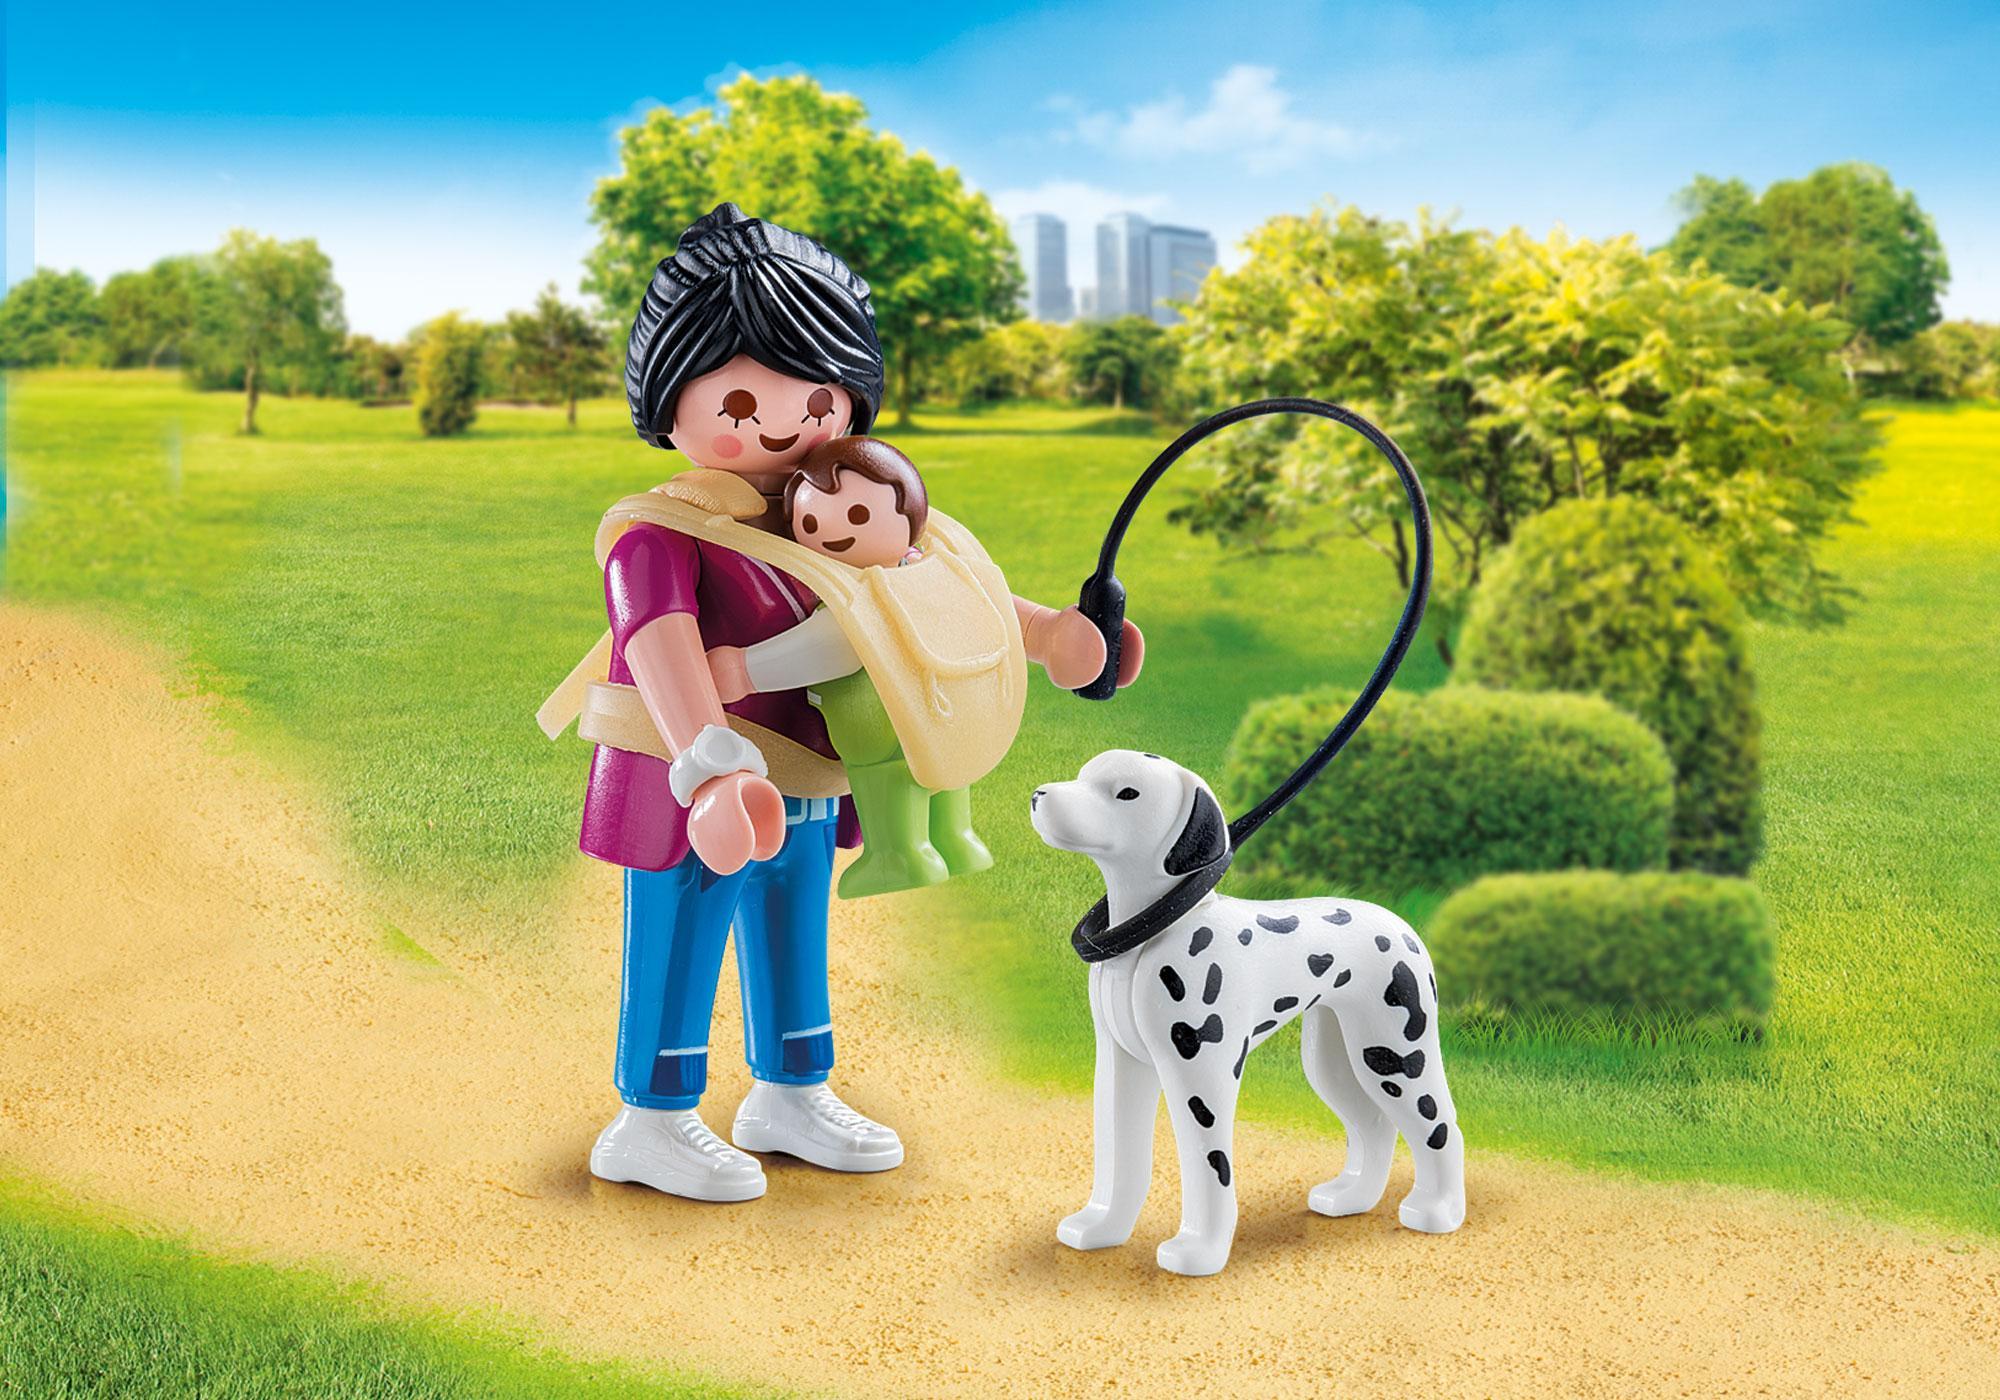 http://media.playmobil.com/i/playmobil/70154_product_detail/Mama met baby in draagzak